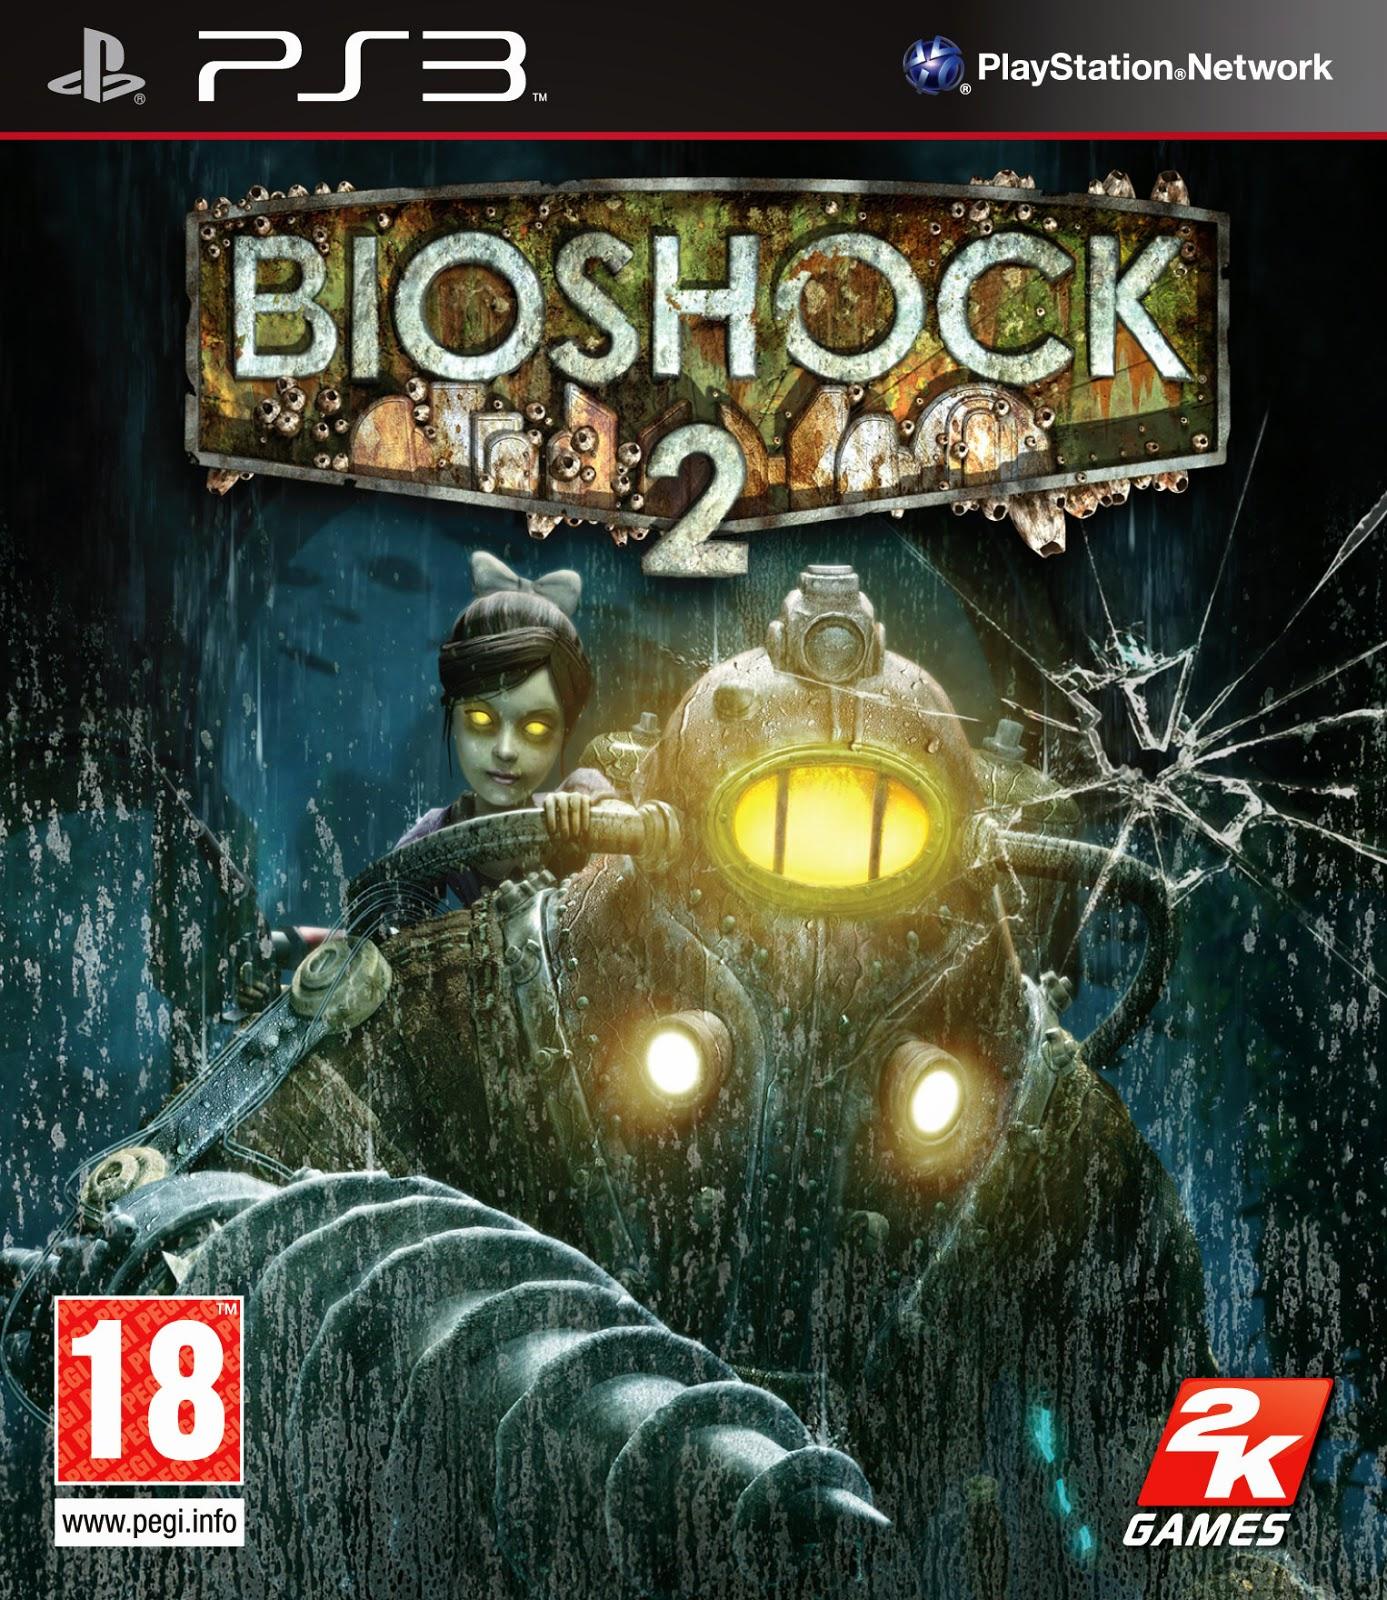 BIO SHOCK PS3